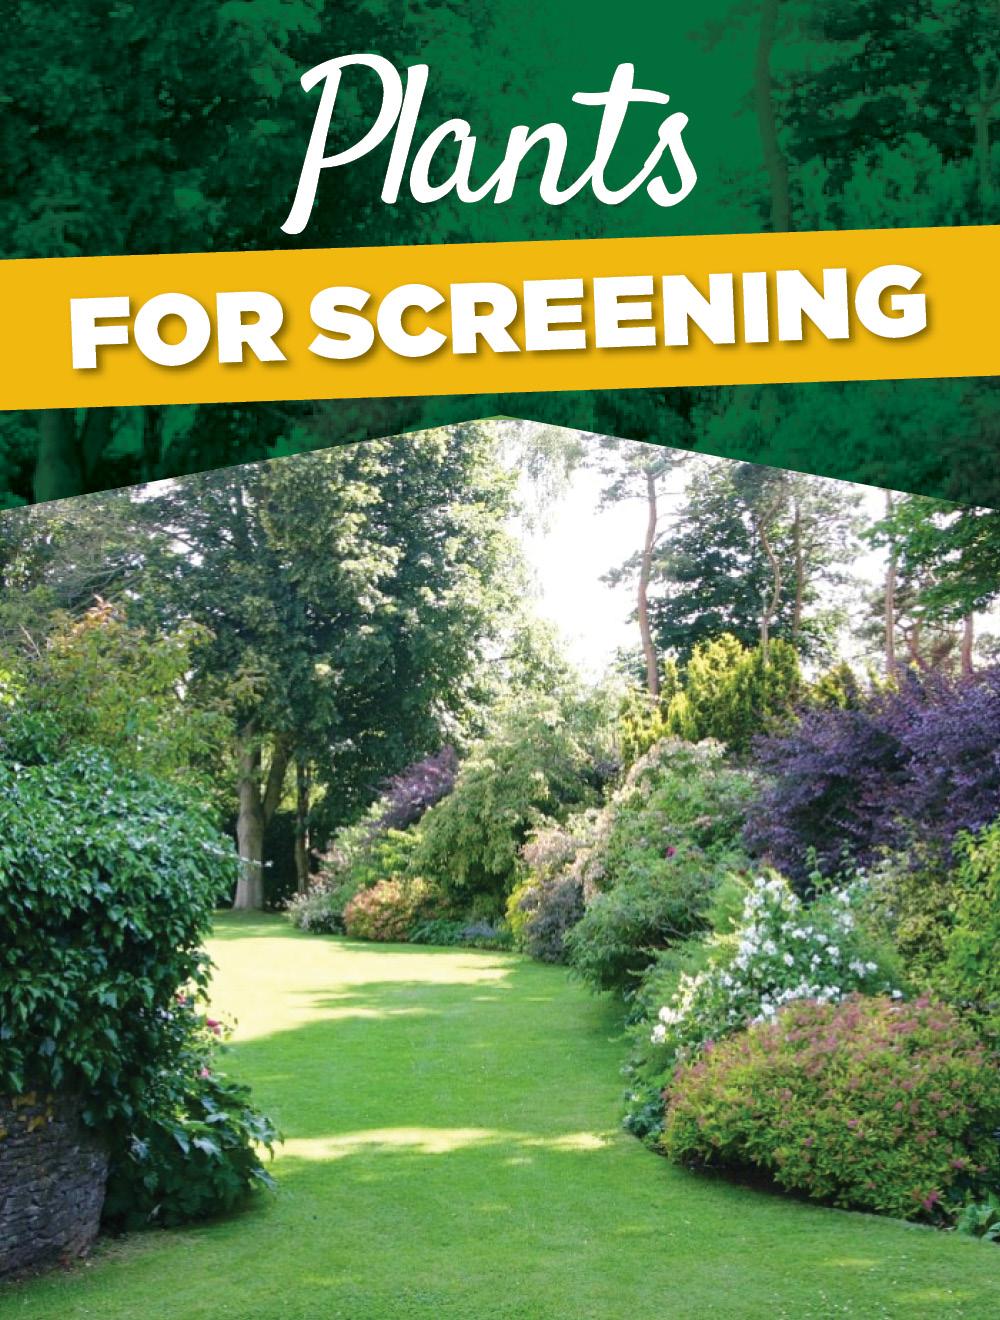 Plants for Screening